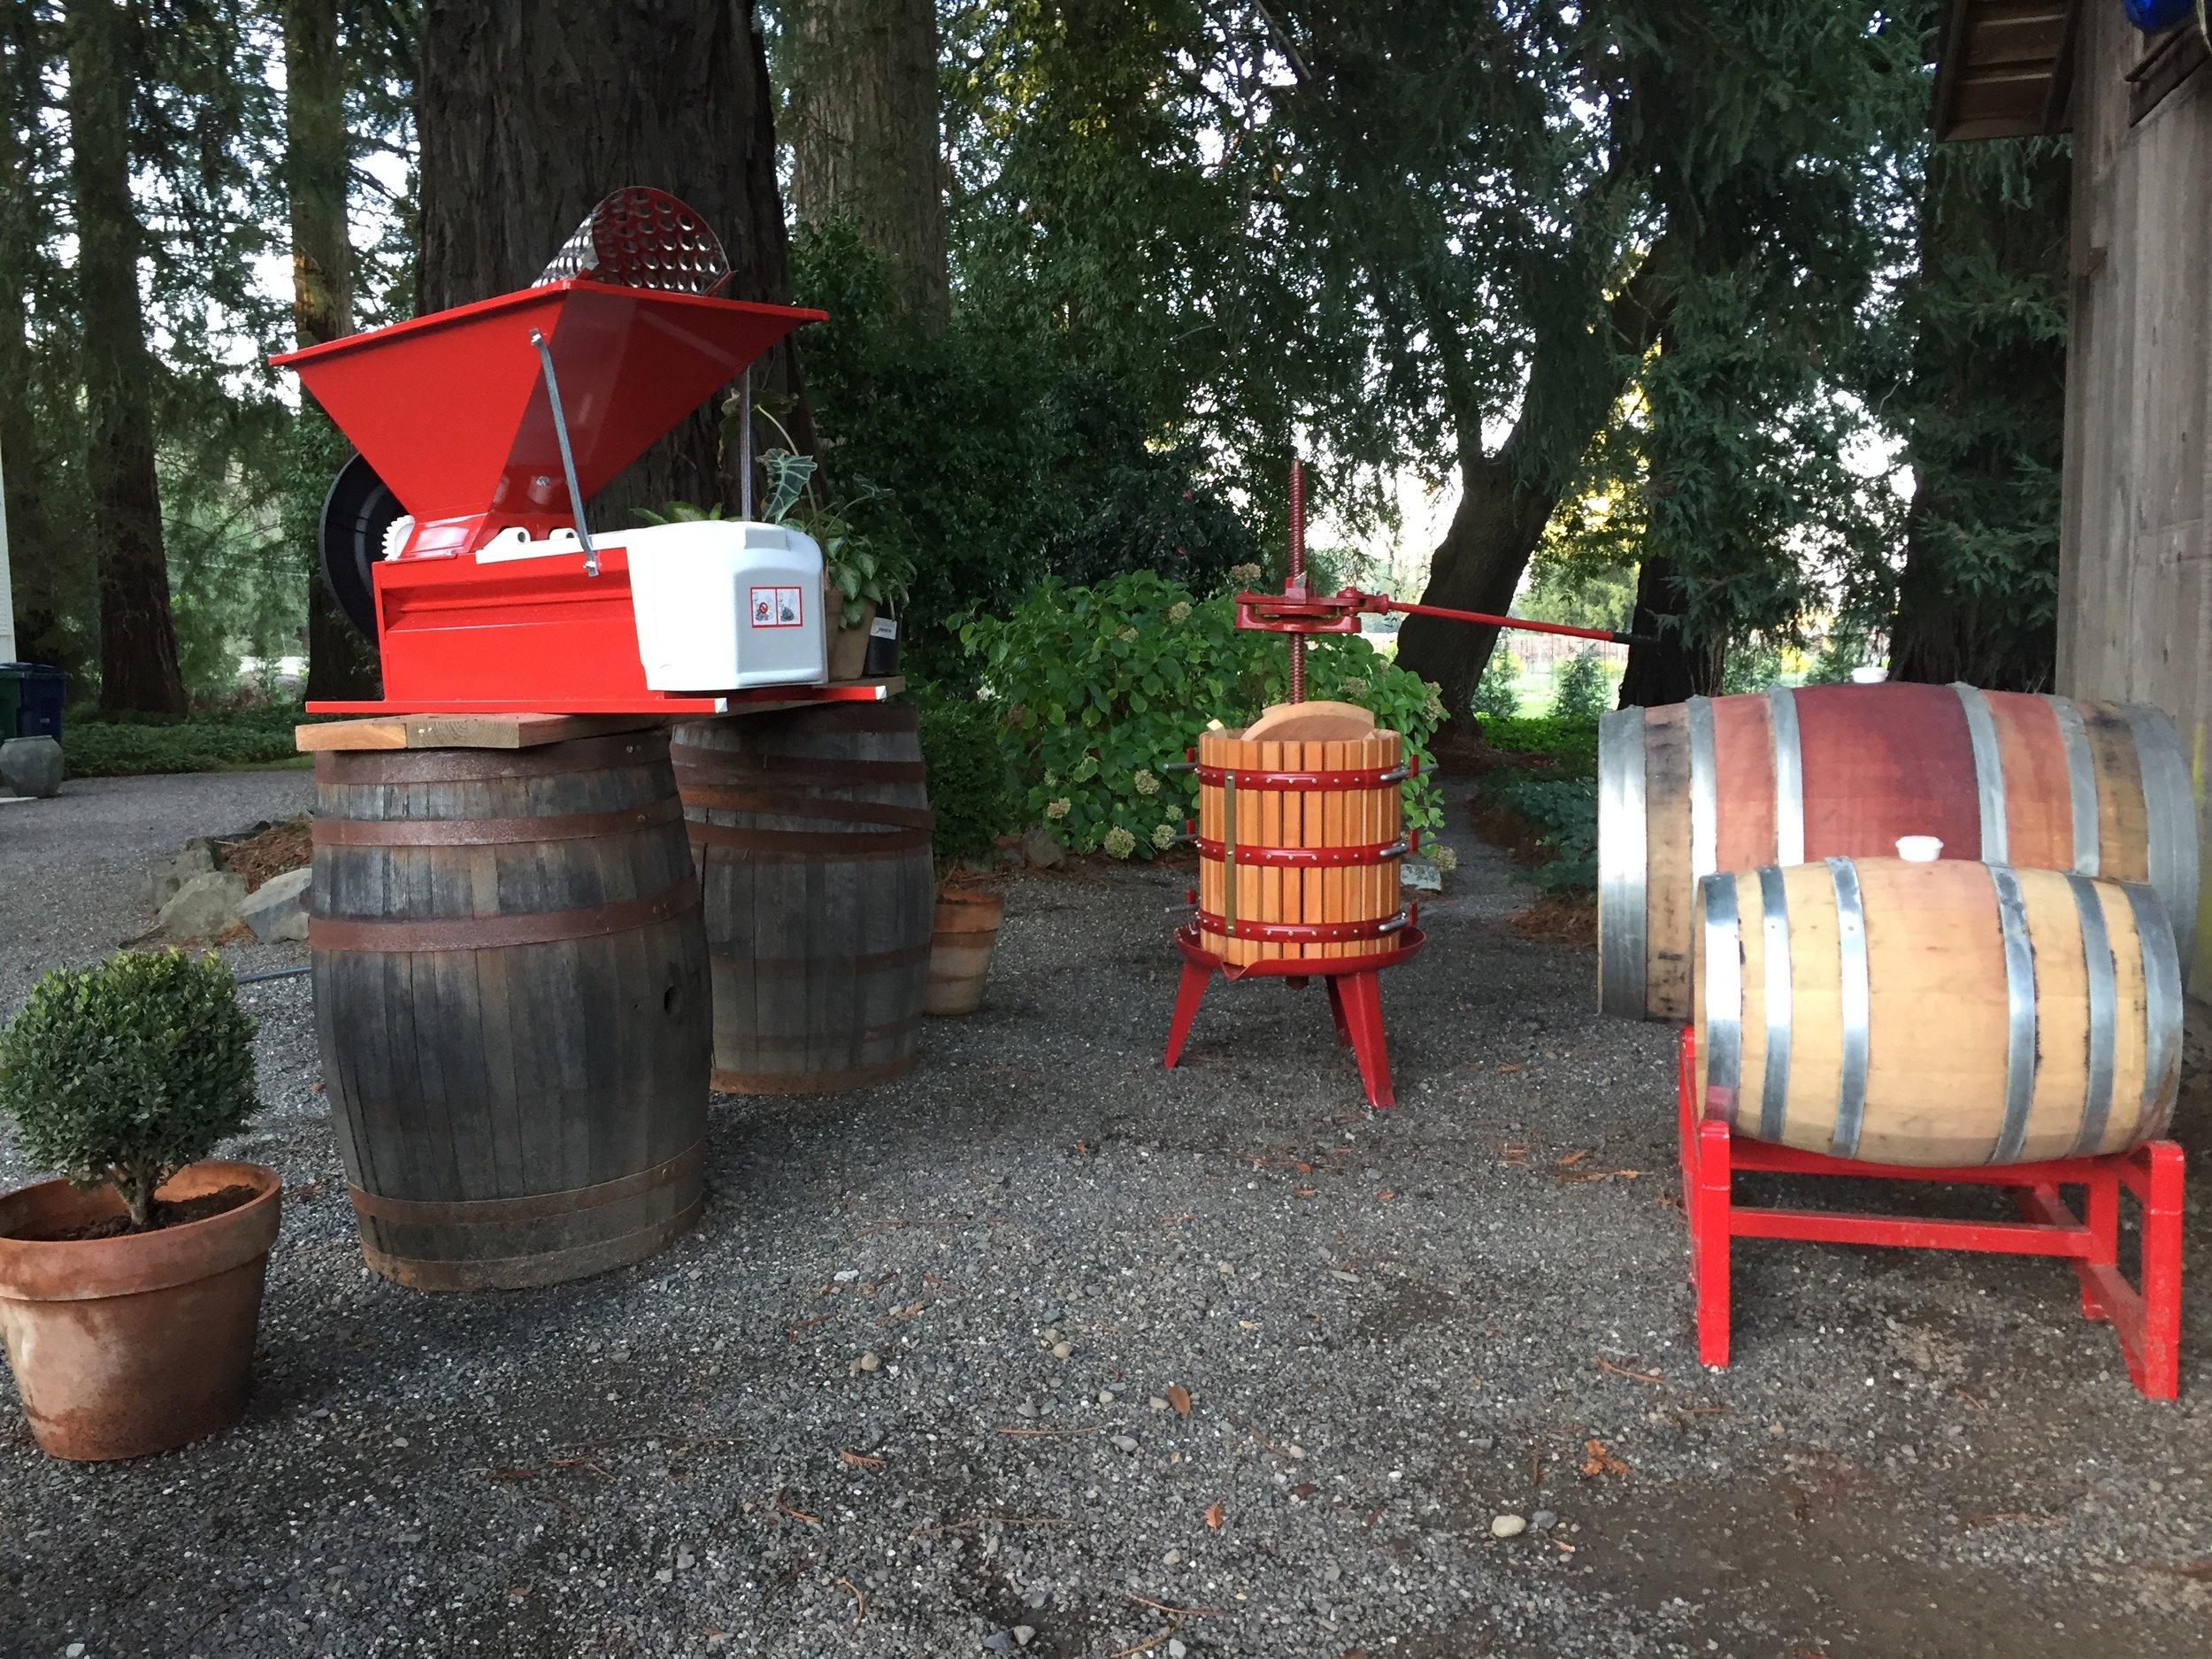 Small batch production: a hand crank crusher /destemmer, grape press, and oak barrels